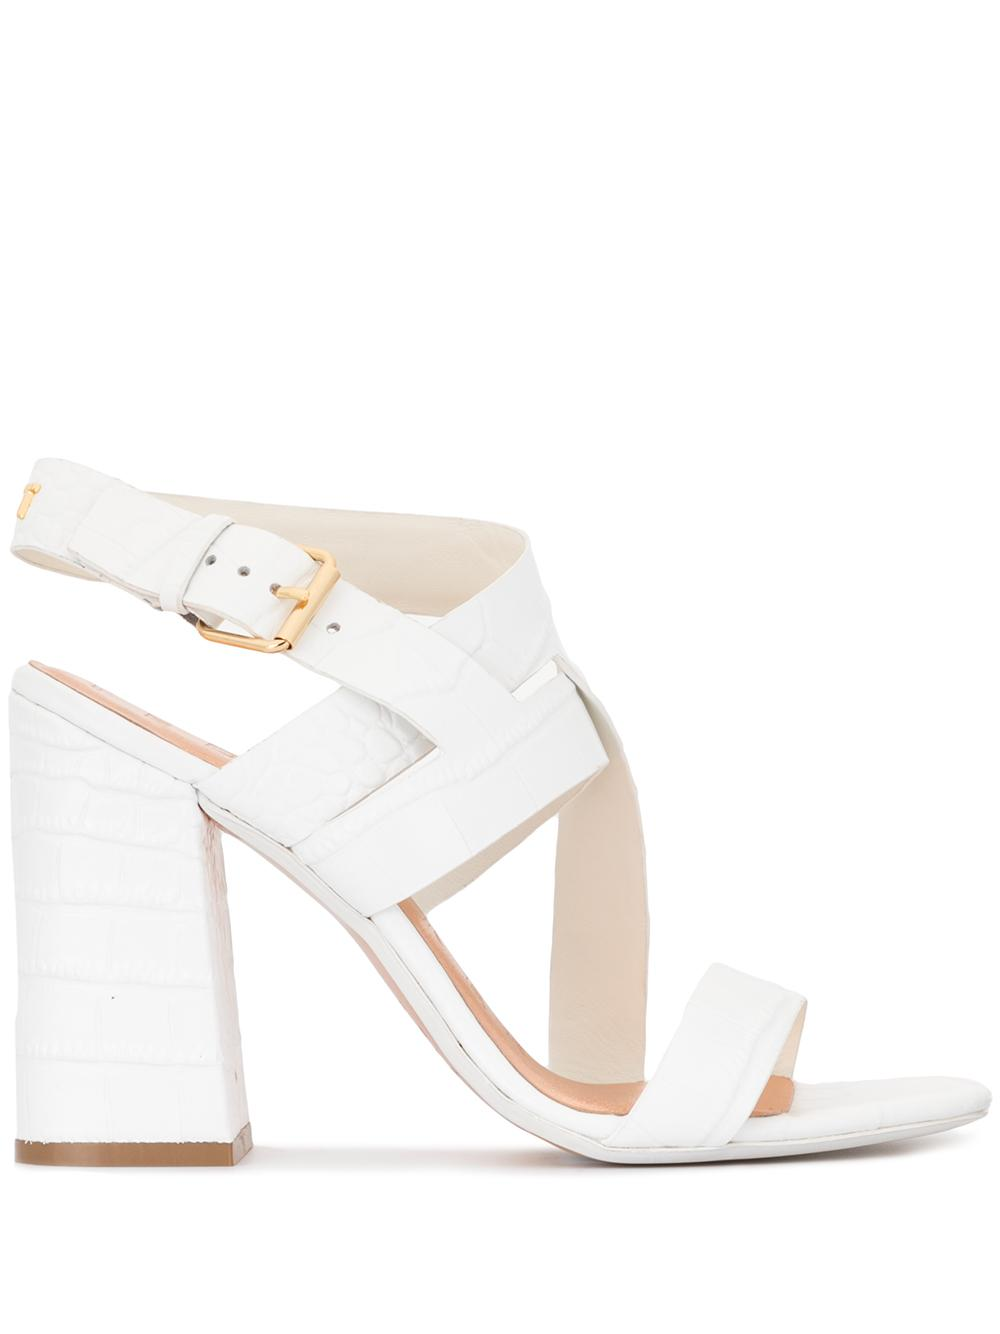 Croc Strappy Block Heel Sandal